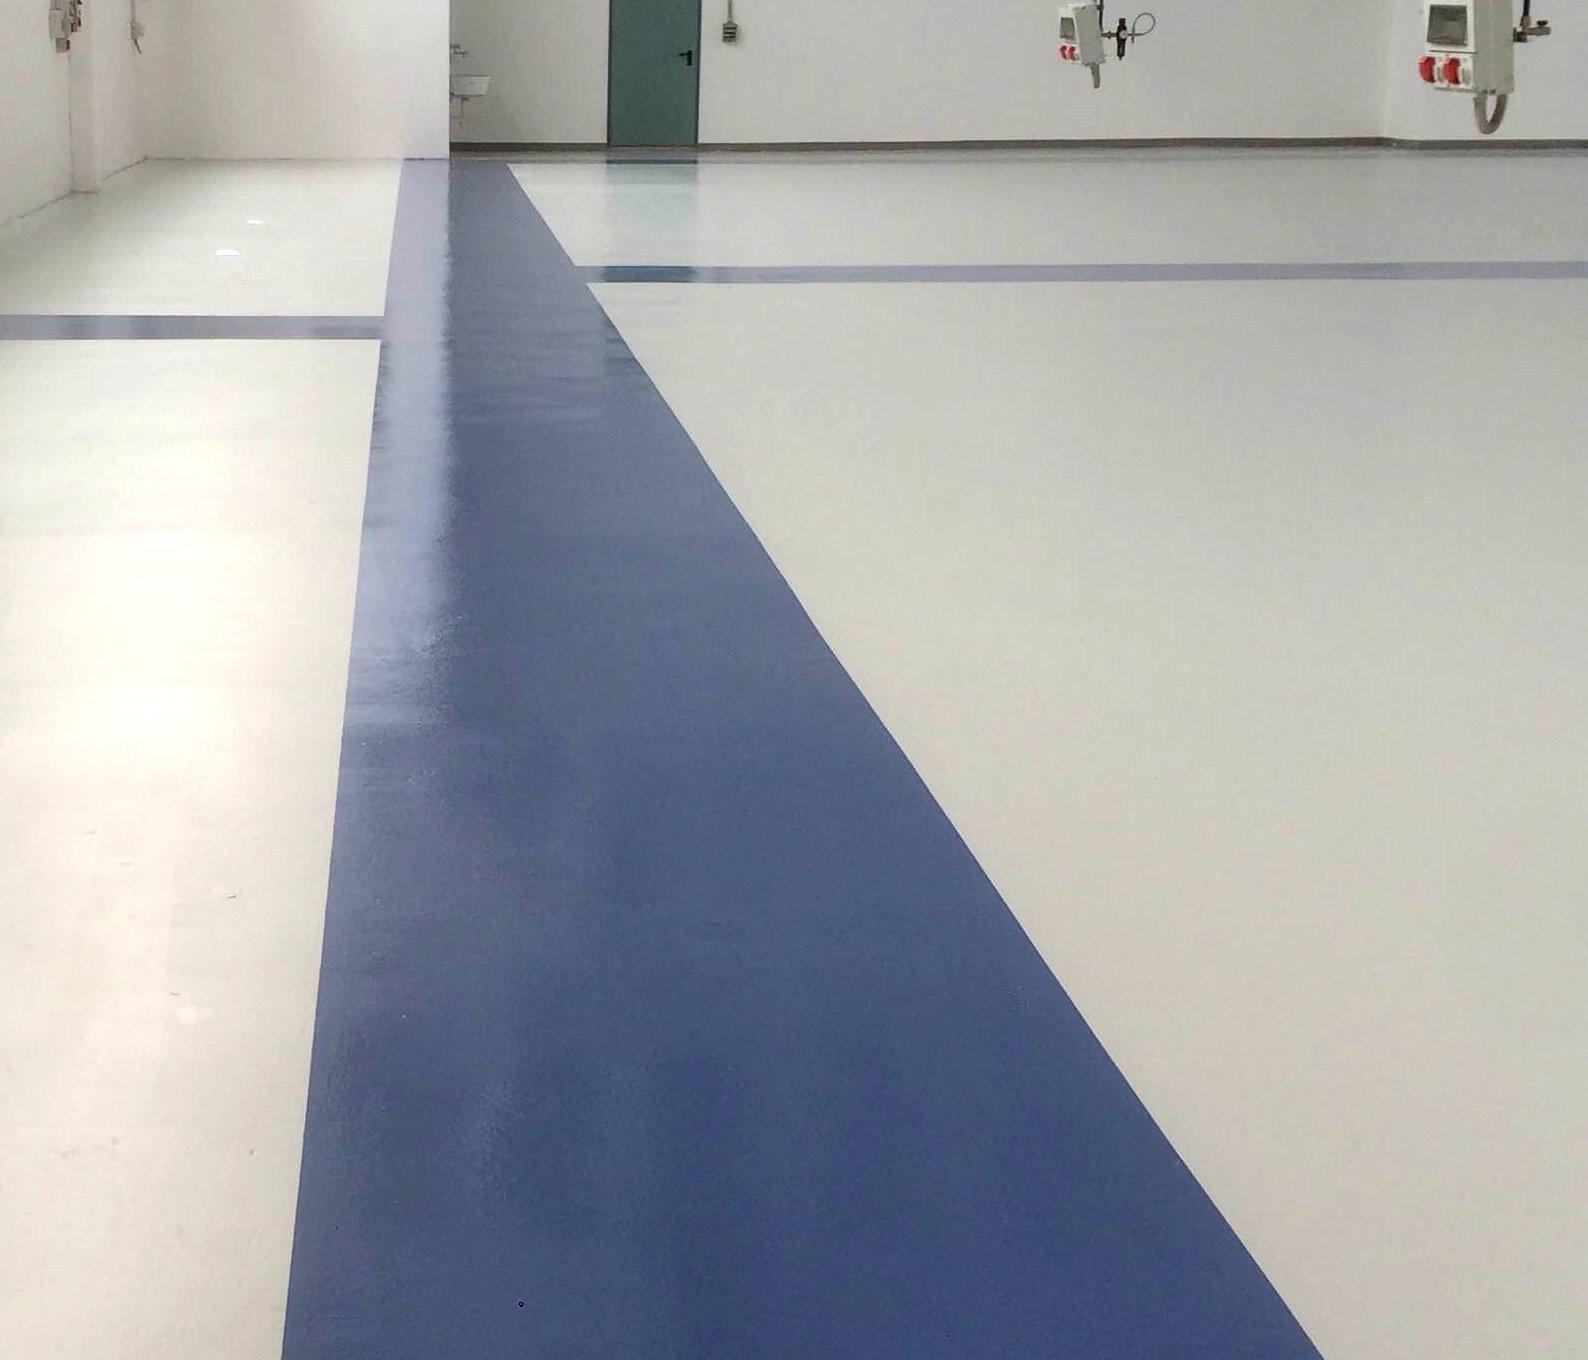 pavimenti in resina per destinazioni d'uso diverse